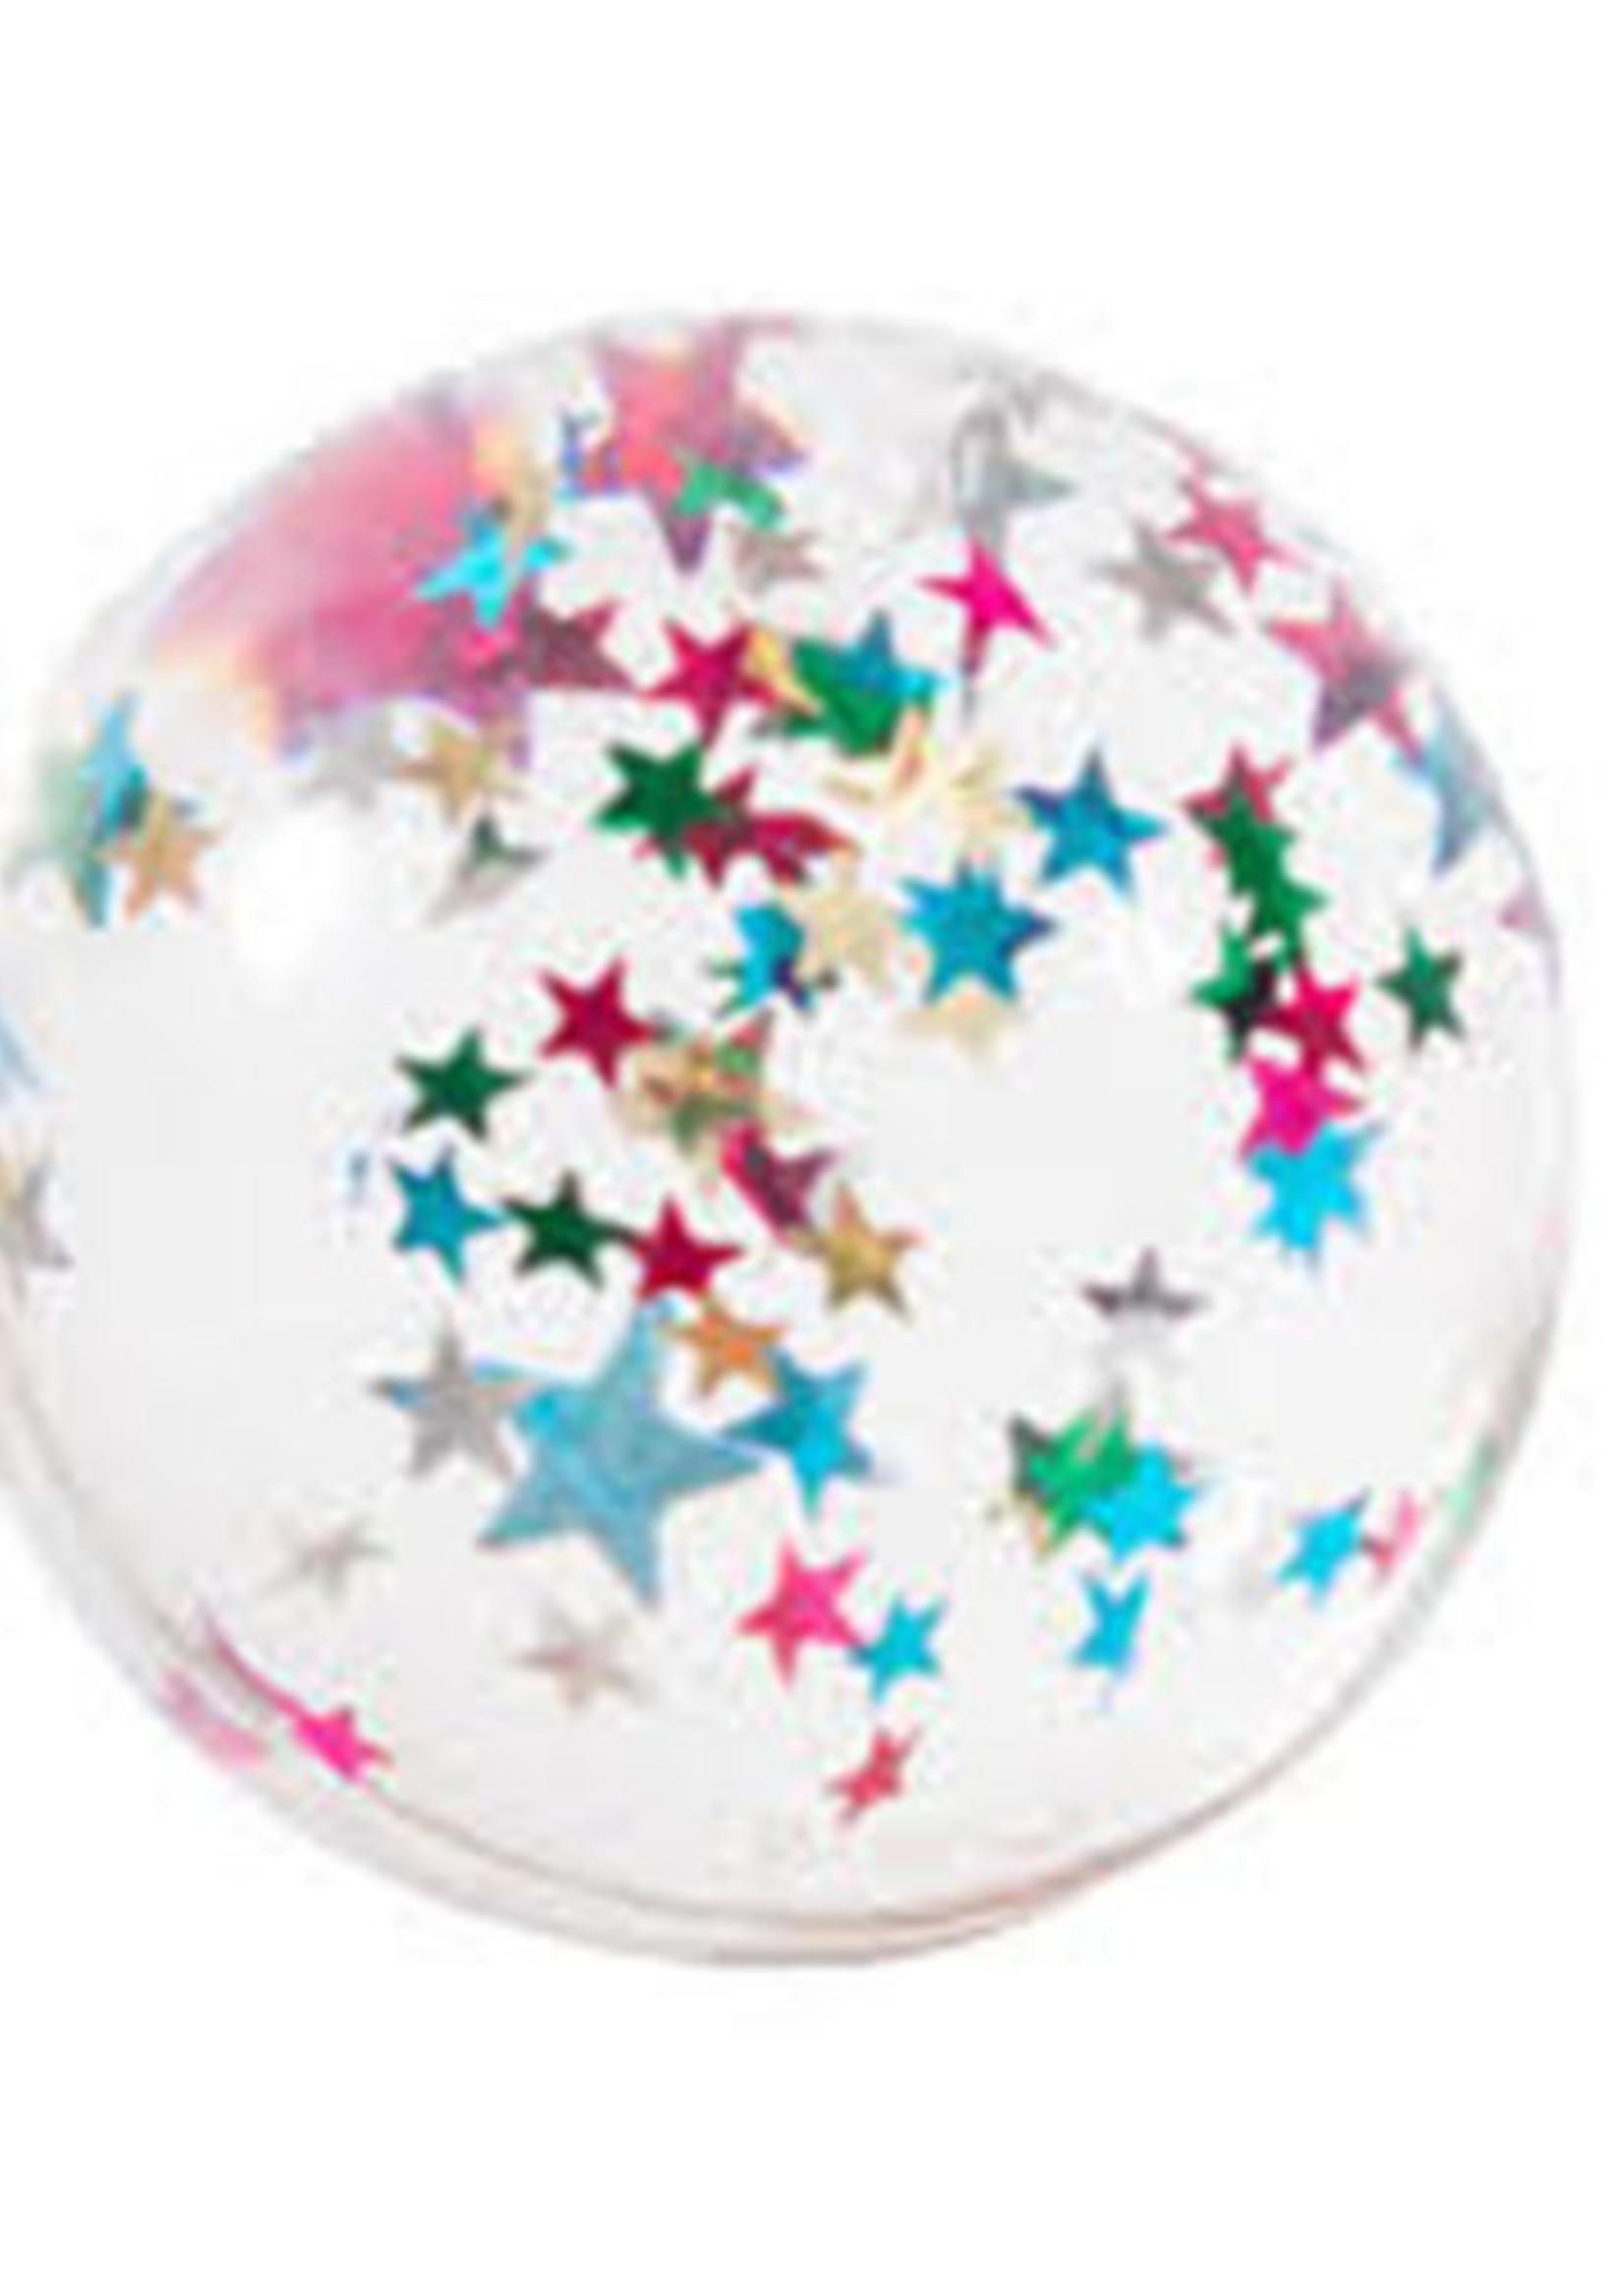 Mideer Midder-ss21 Aujourd hui cest mercredi - Bouncy Balls in Jar (48 Assorted)     Code: 713137